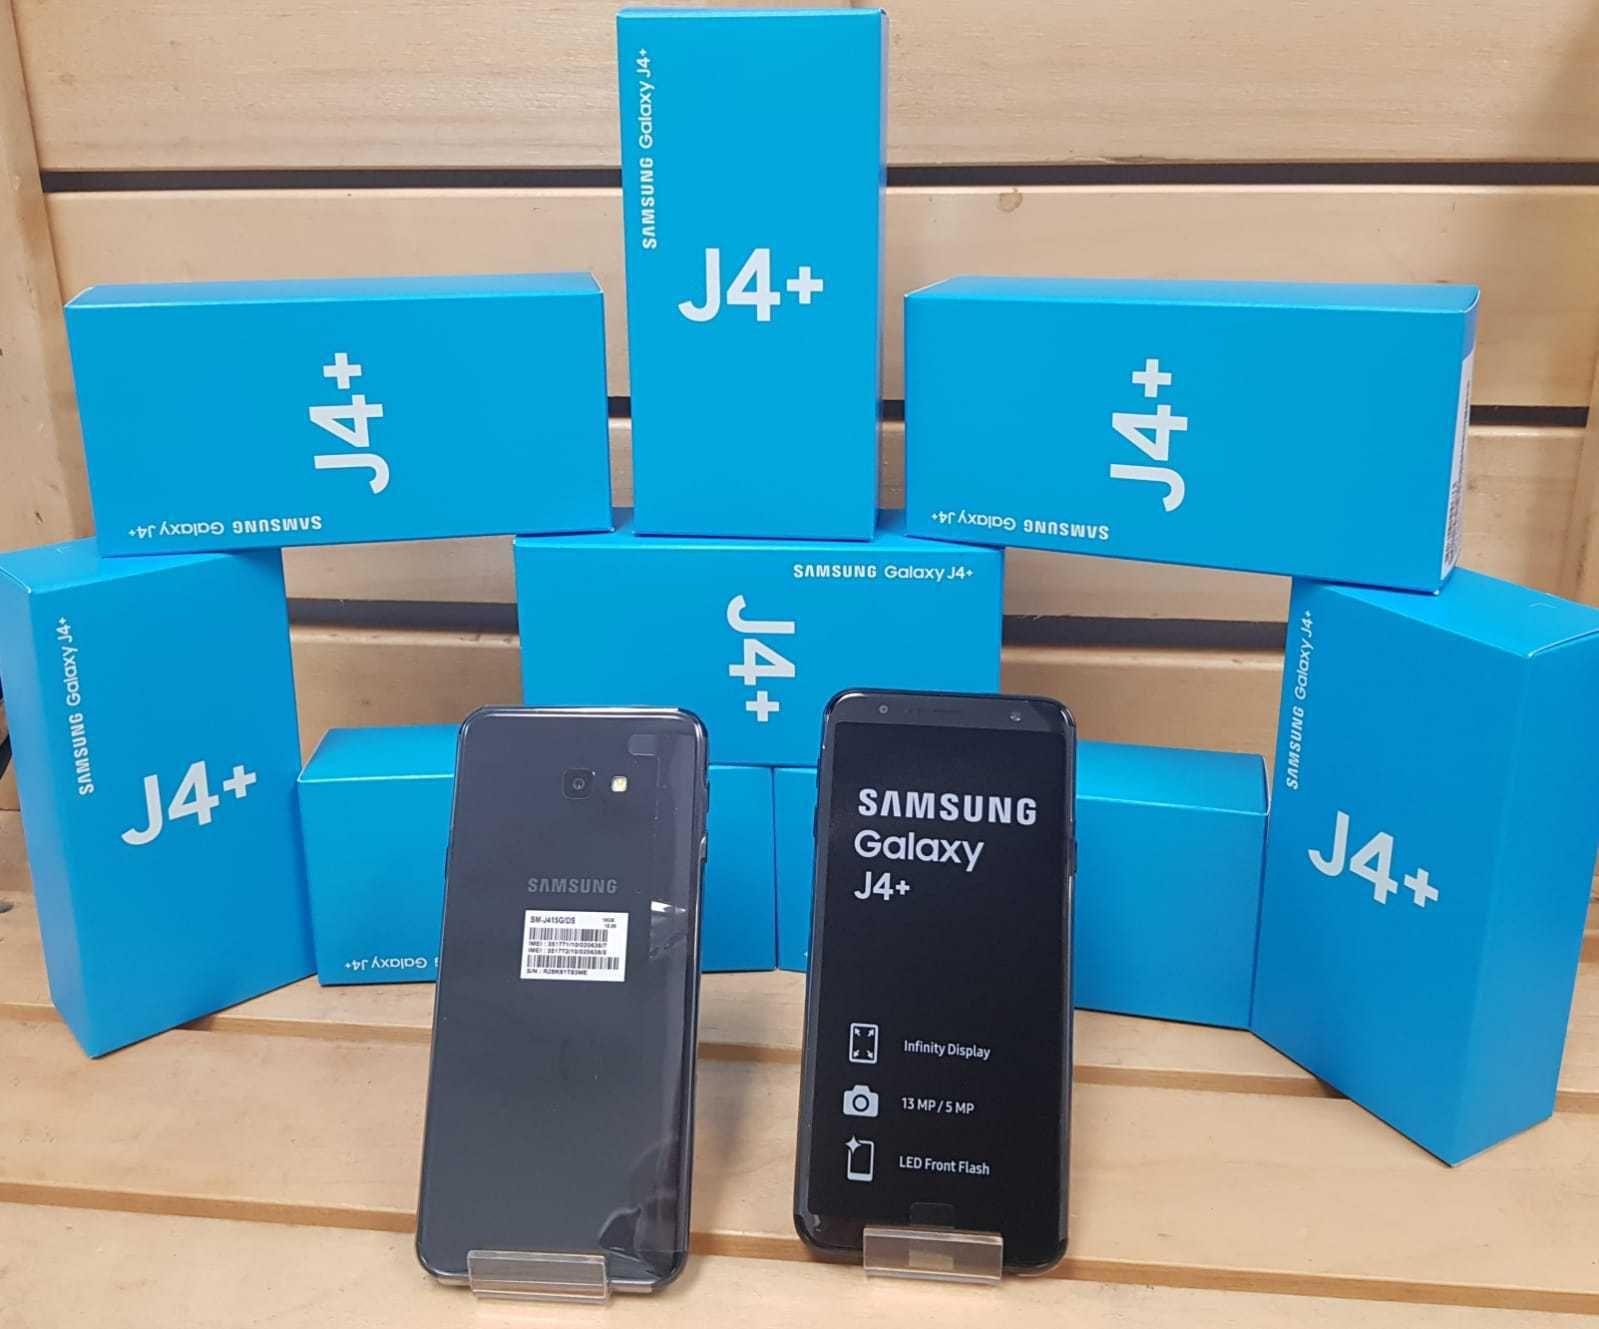 159 50 | SAMSUNG GALAXY J4 PLUS 16 GB ( J415 ) BLACK FACTORY UNLOCK